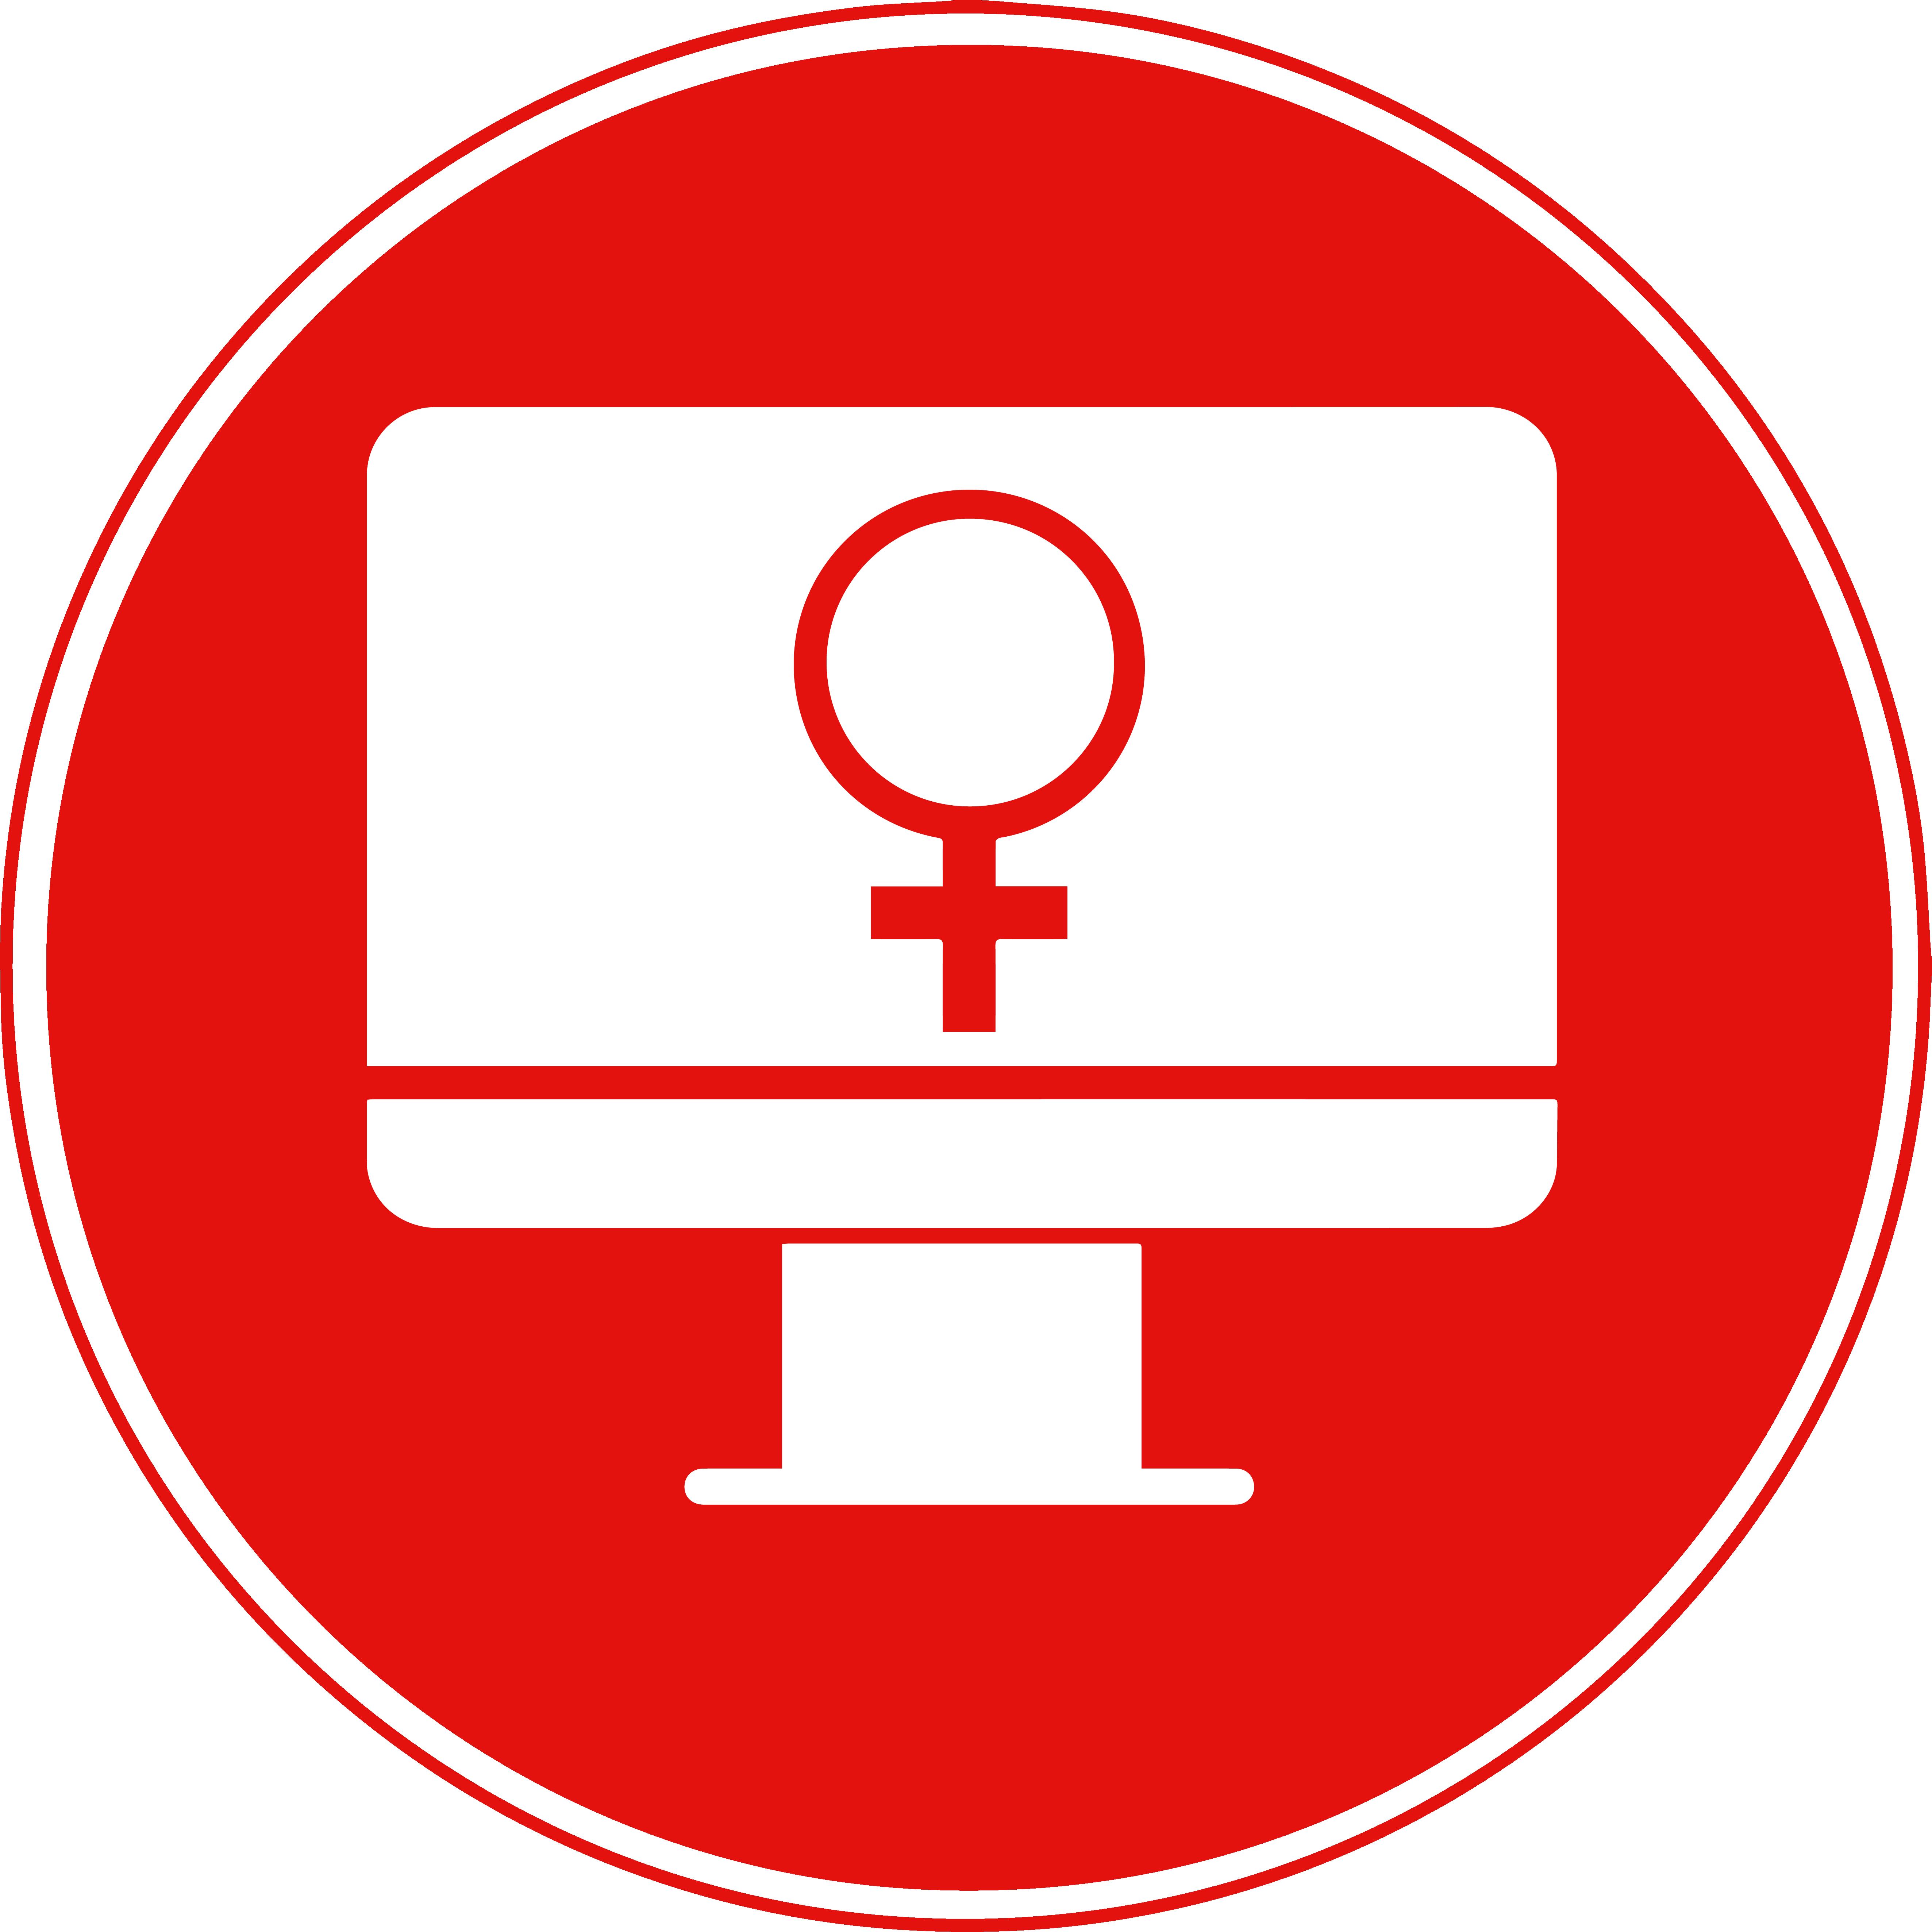 The Women in Tech Award